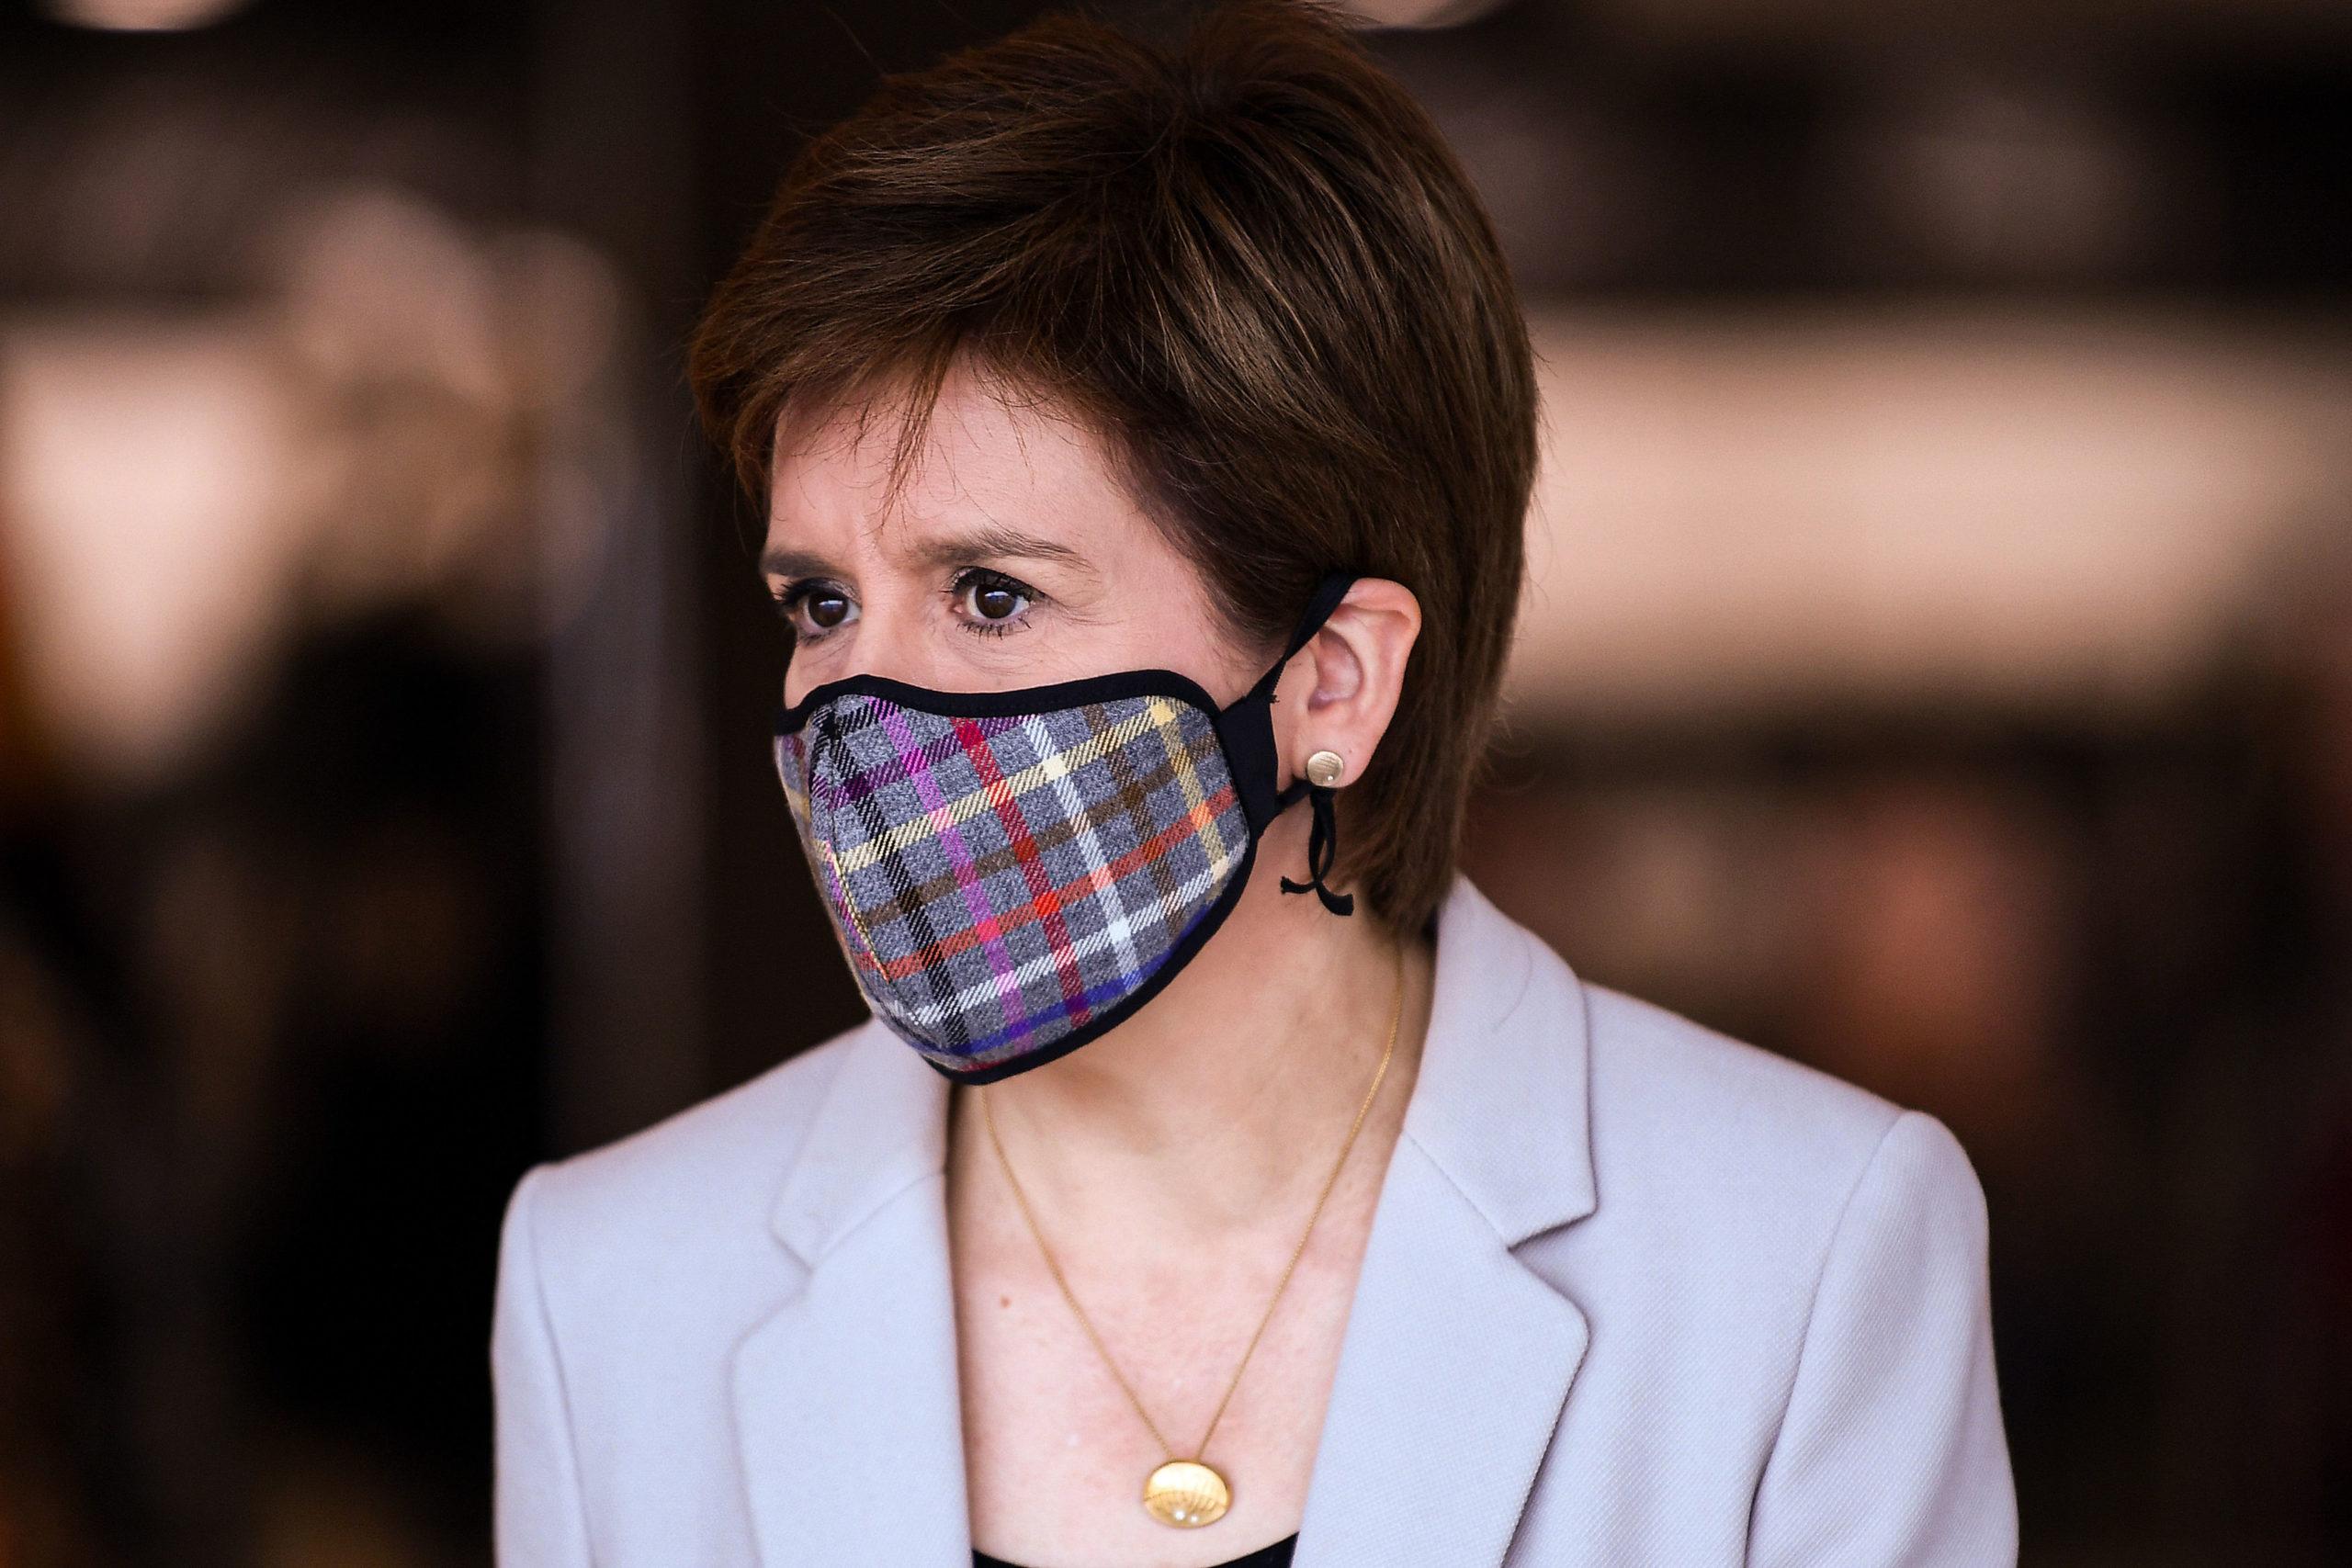 First Minister Nicola Sturgeon wearing a tartan face mask